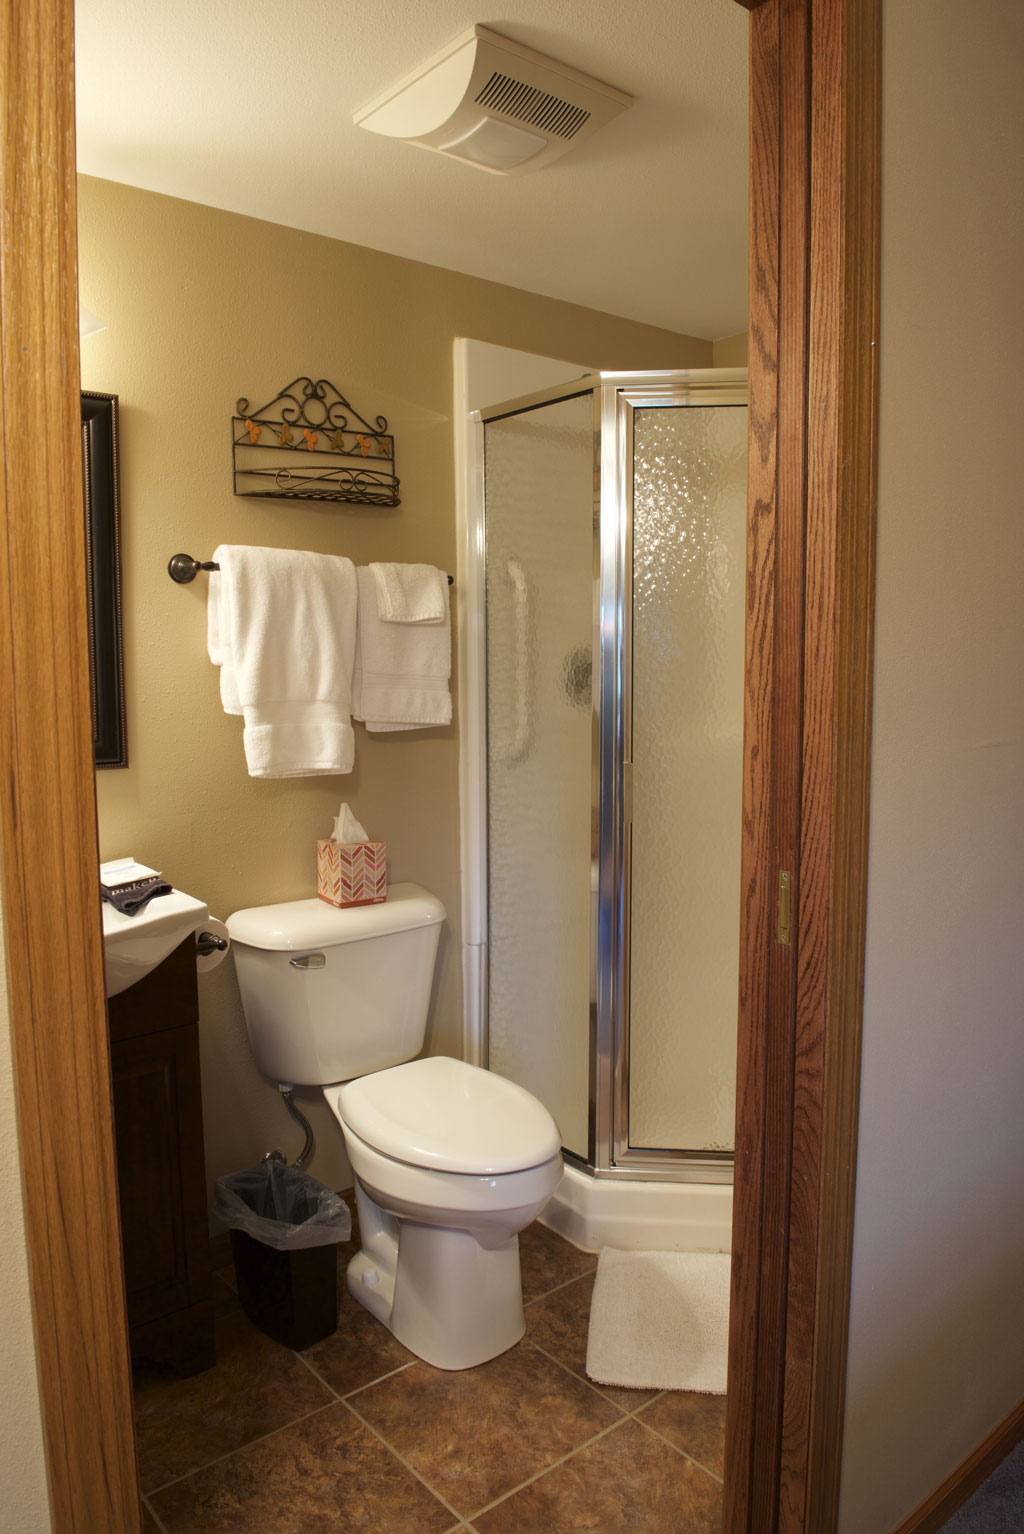 The poppy bathroom